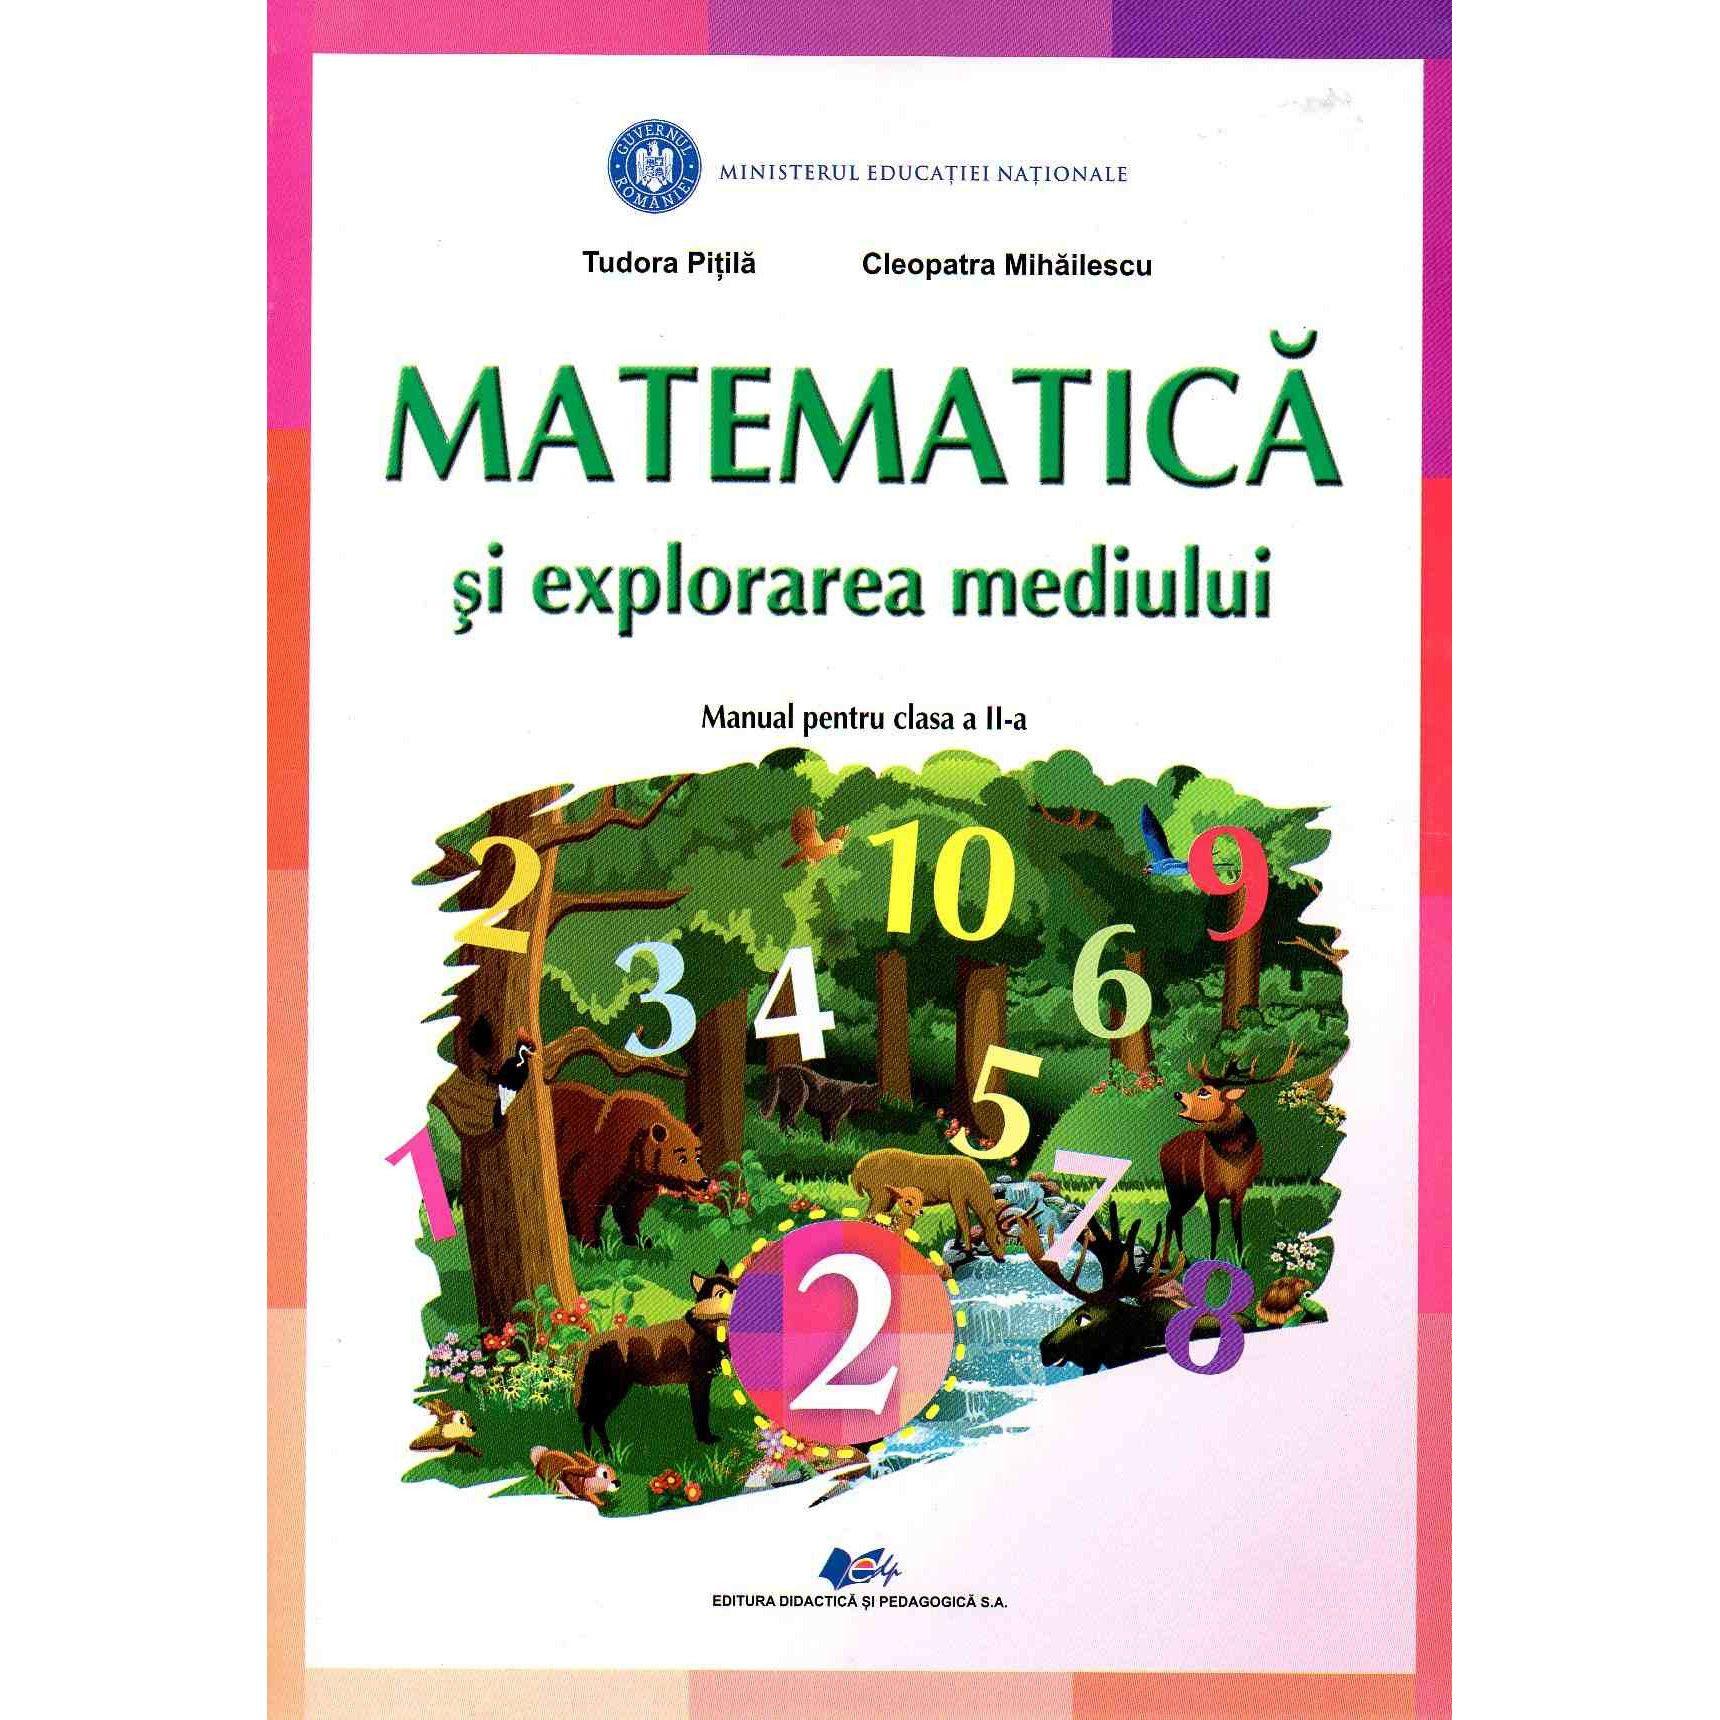 Matematica  nu are vacanta! (2)